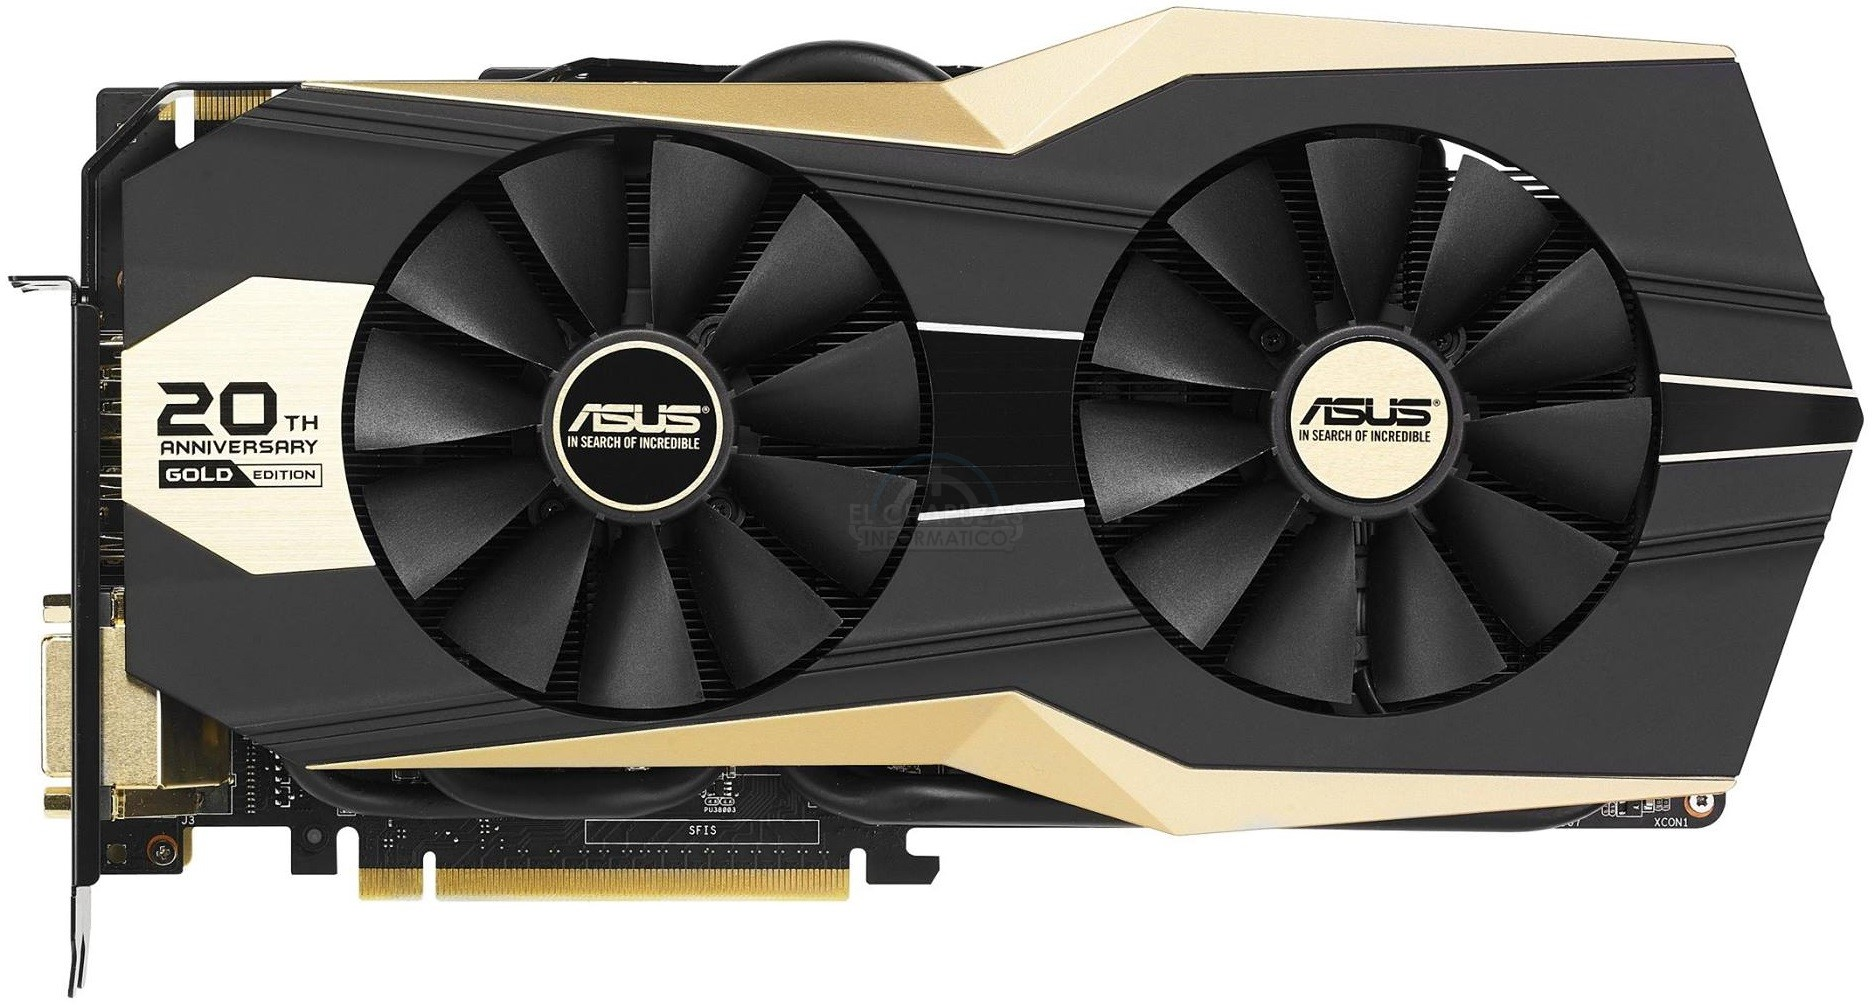 Asus GeForce GTX 980 Ti 20th Anniversary Gold Edition